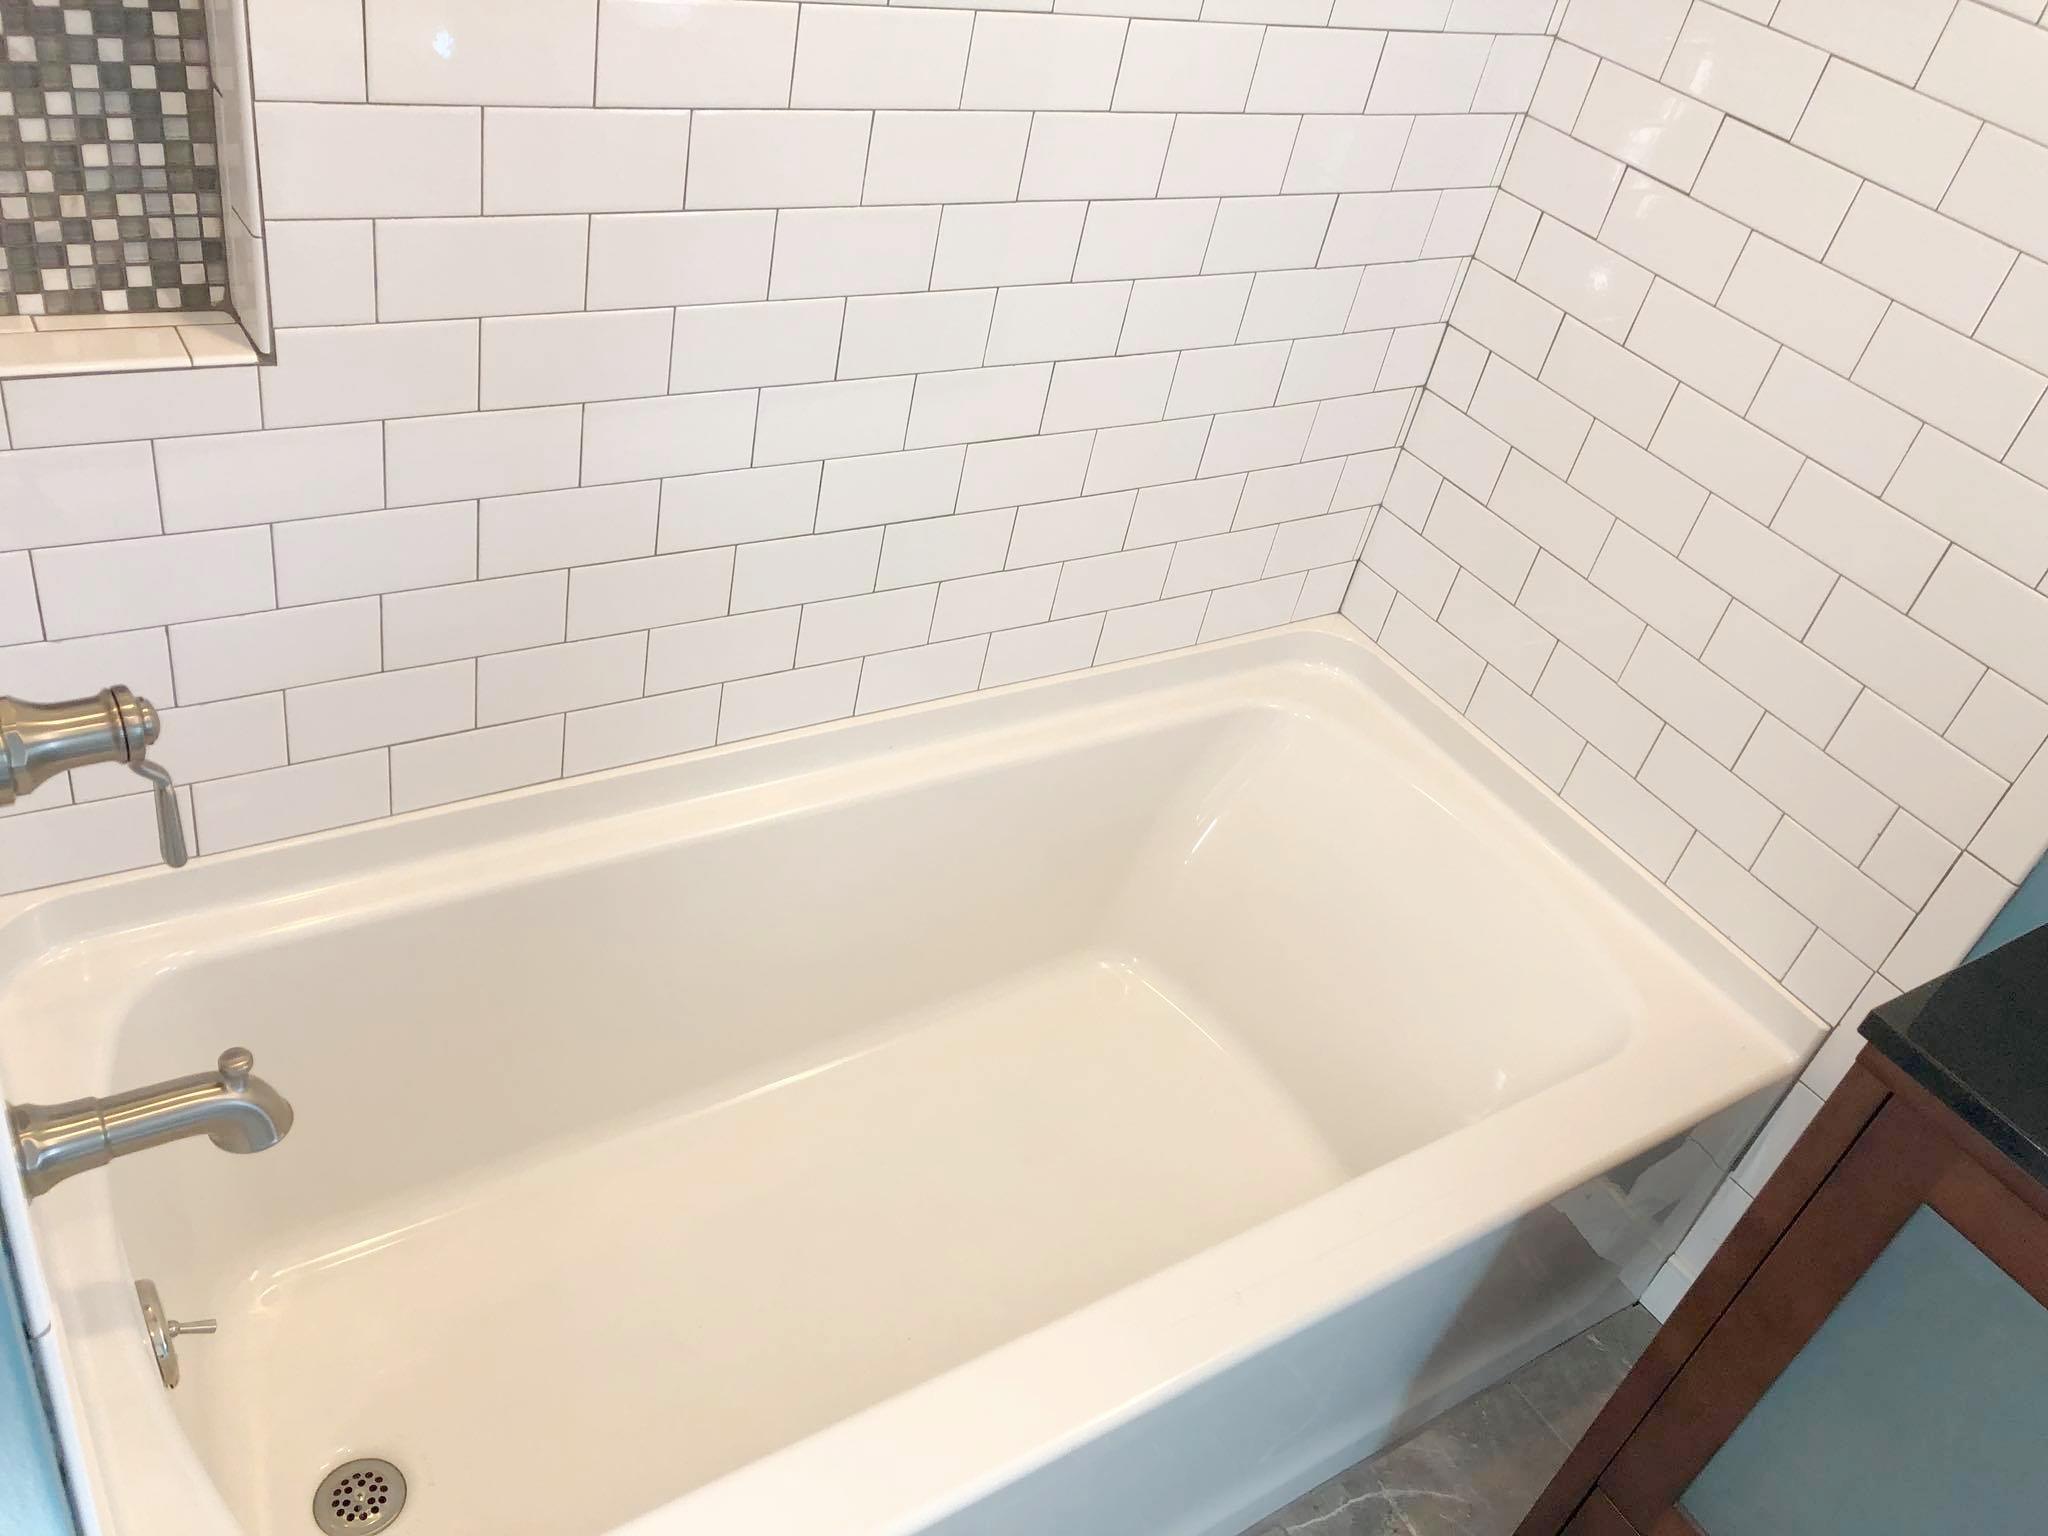 Ceramic Coatings in Bathrooms